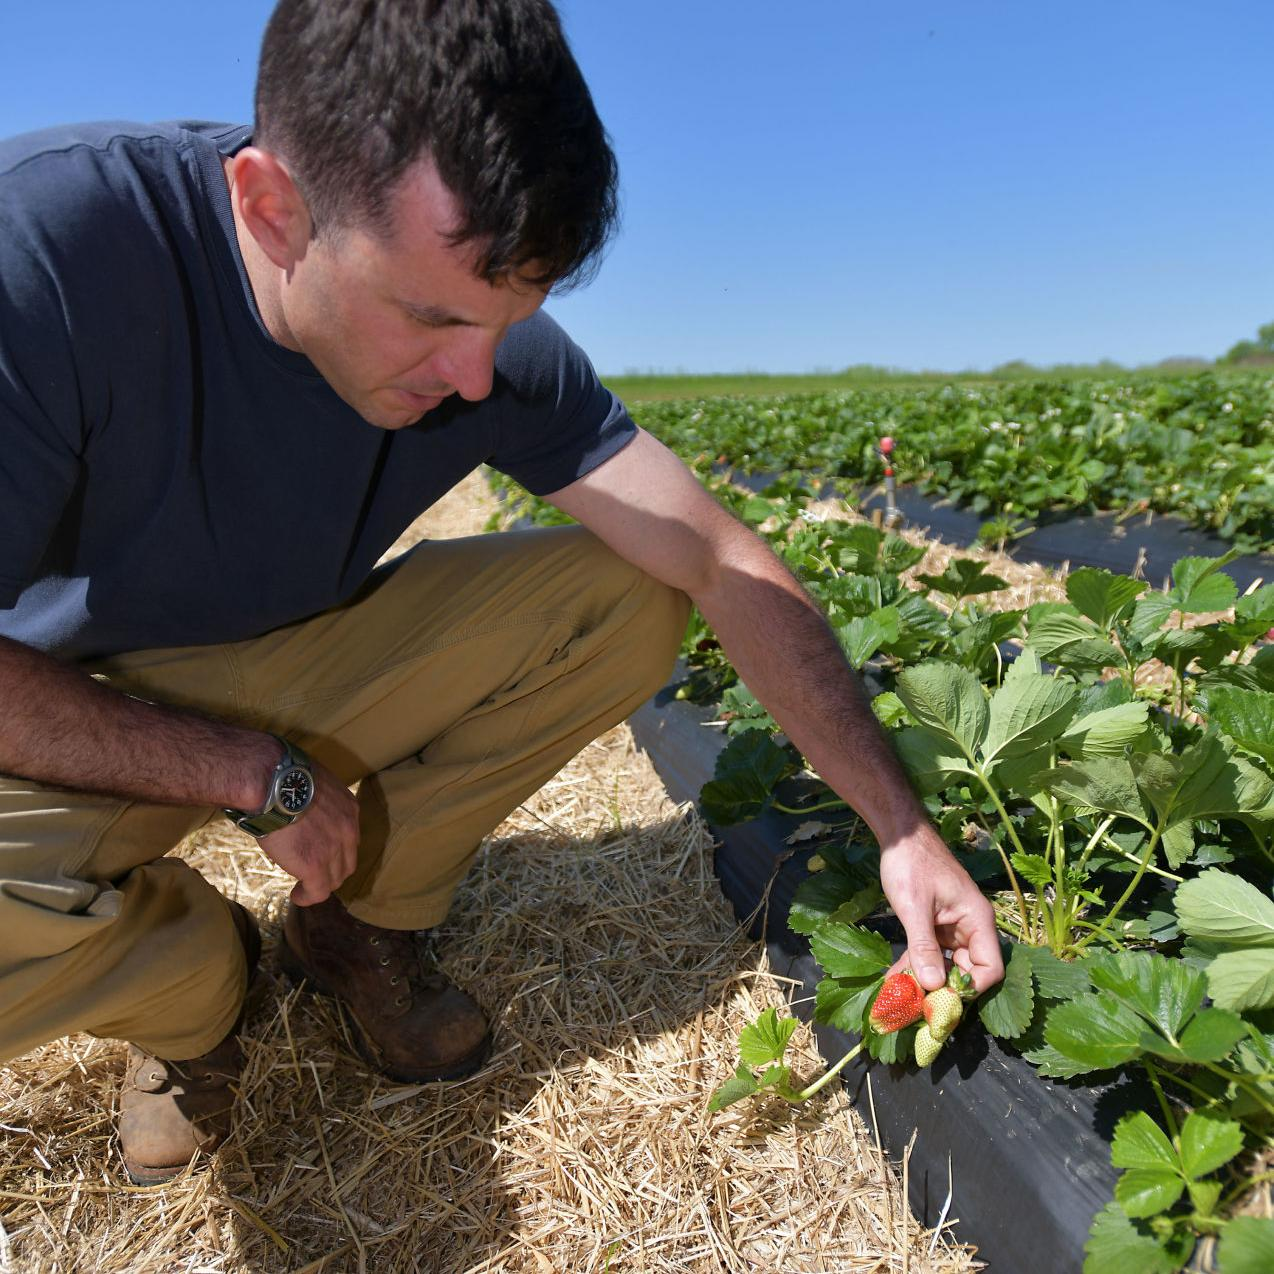 It S Strawberry Season Again At Scott S Farms In Unicoi Lifestyles Heraldcourier Com